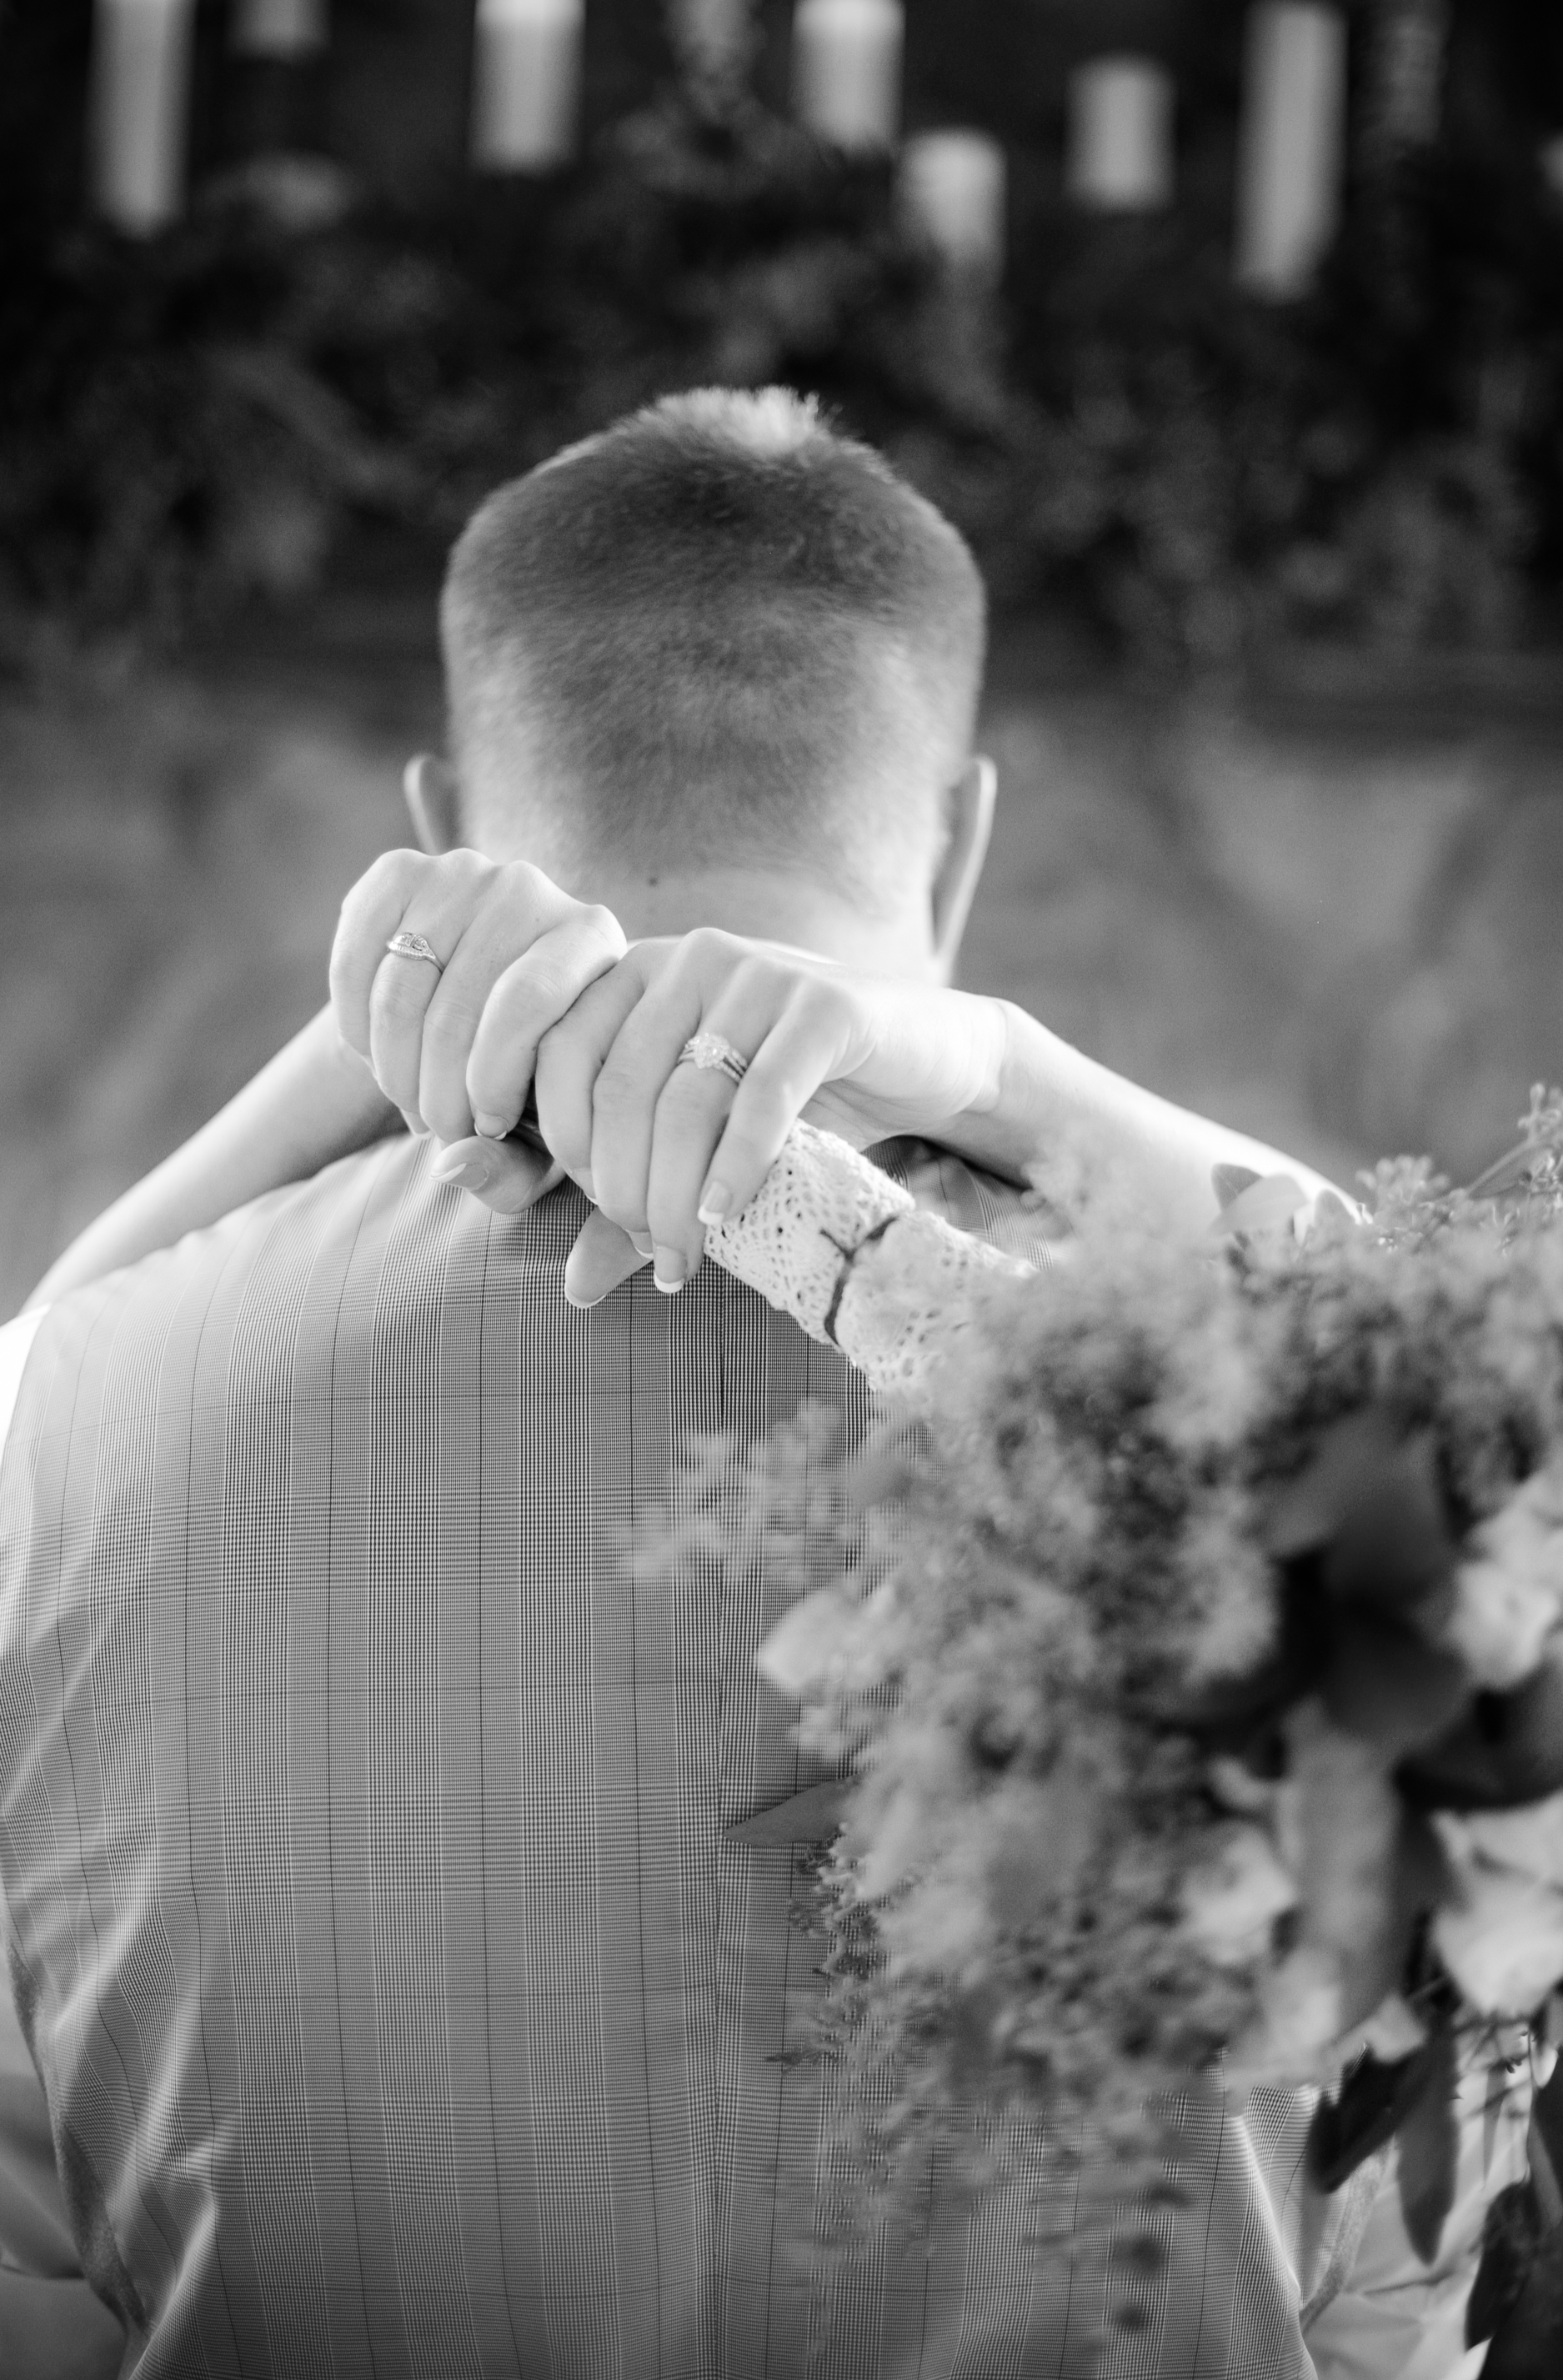 Luke_Sarah_Calaway_Wedding_12Aug17_0239.jpg